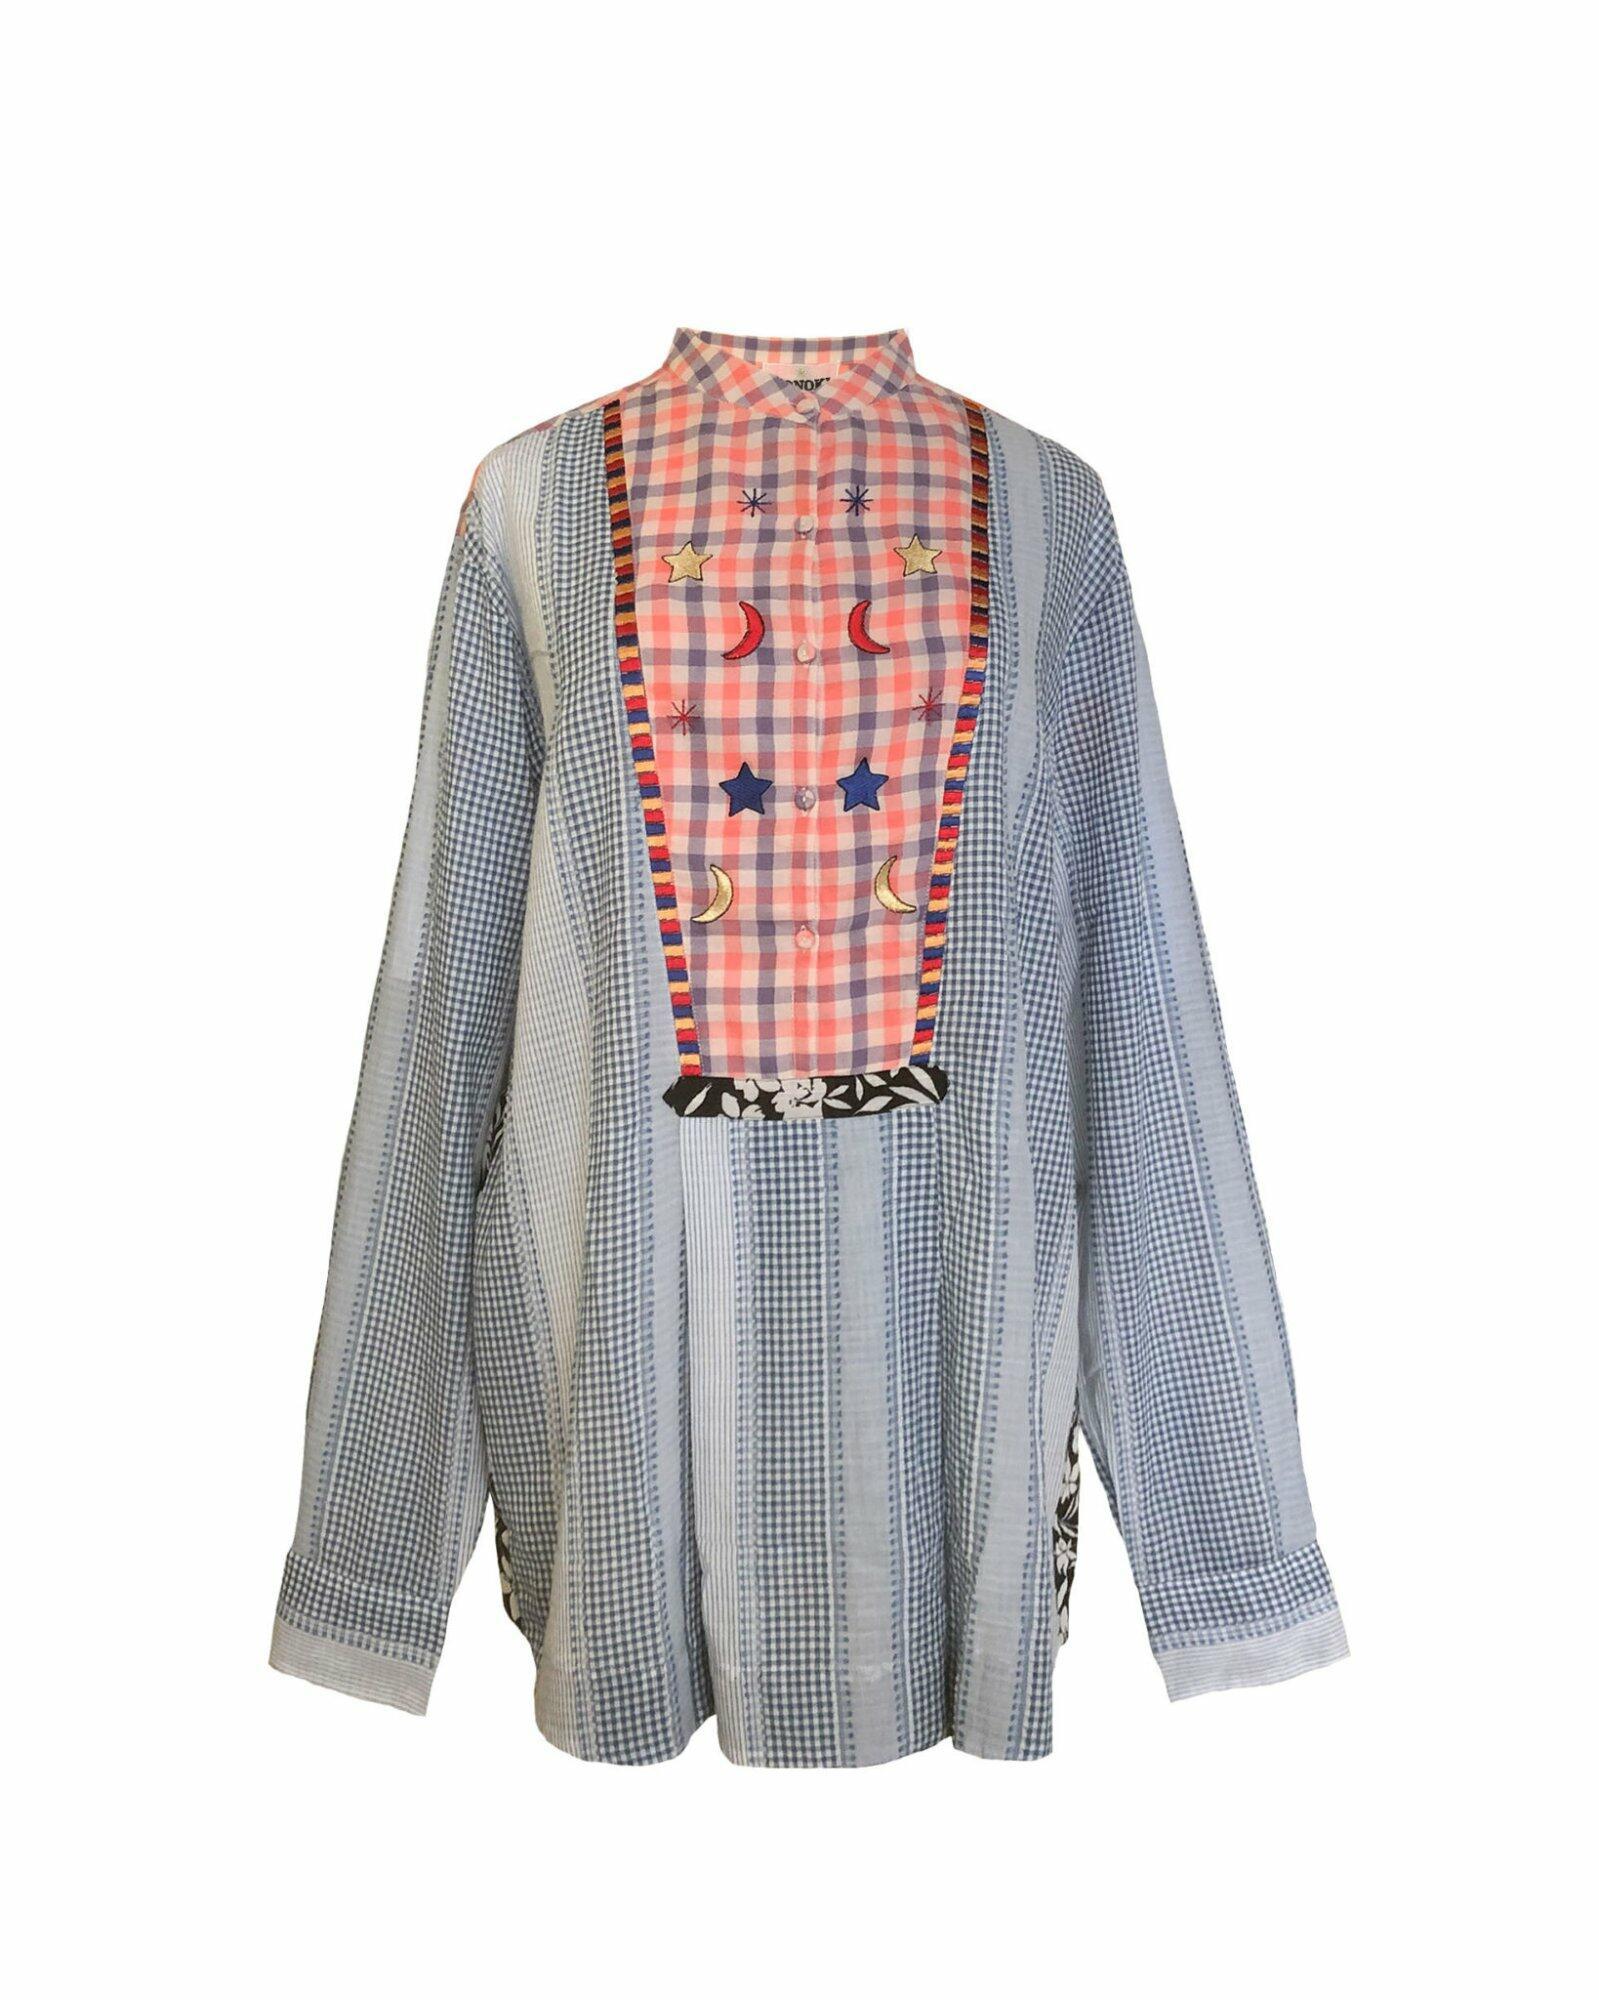 Vichy Rose and Stripes Shirt